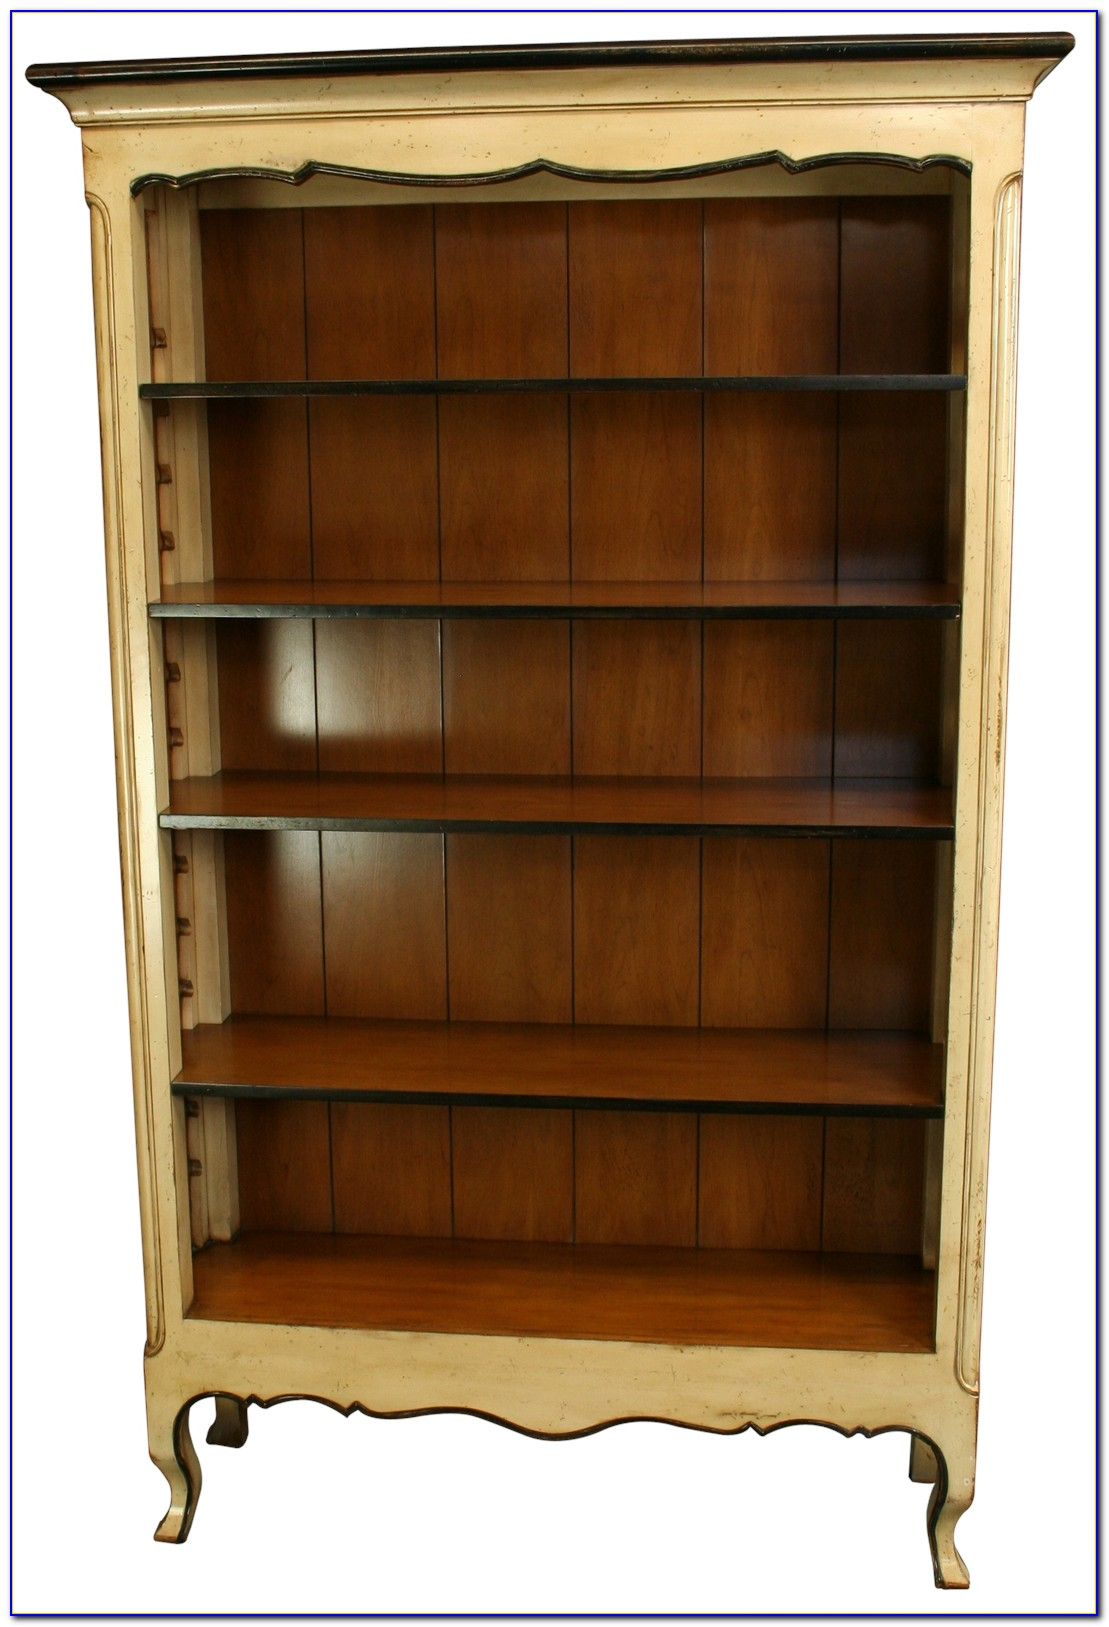 French Country Bookshelf